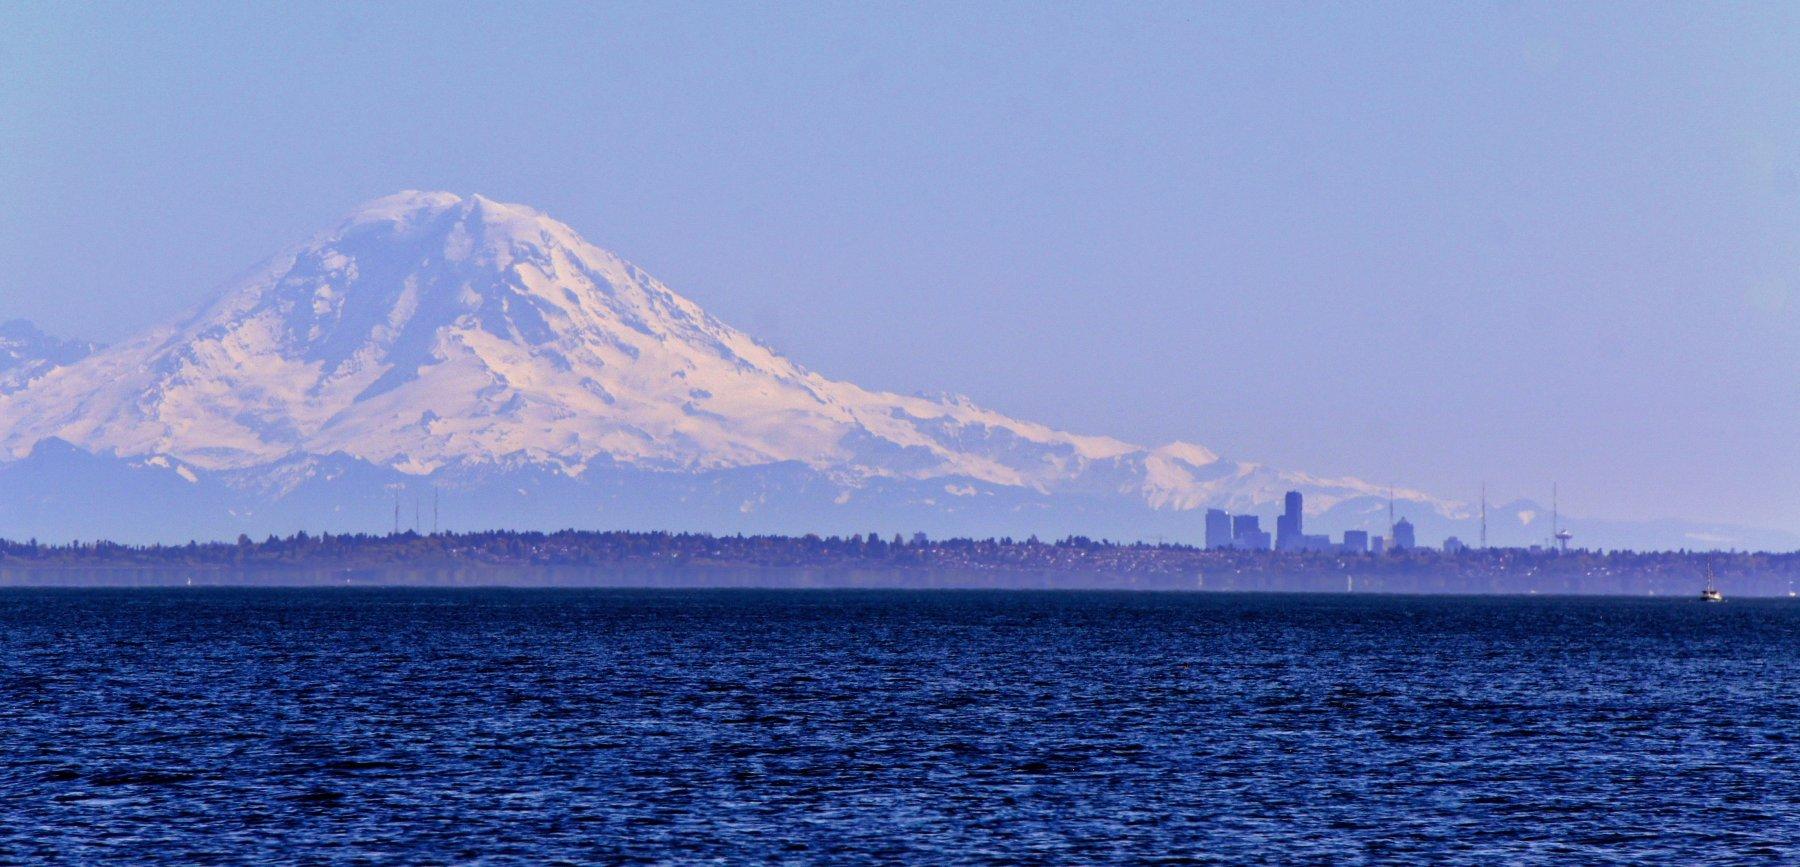 Seattle Skyline with Rainier